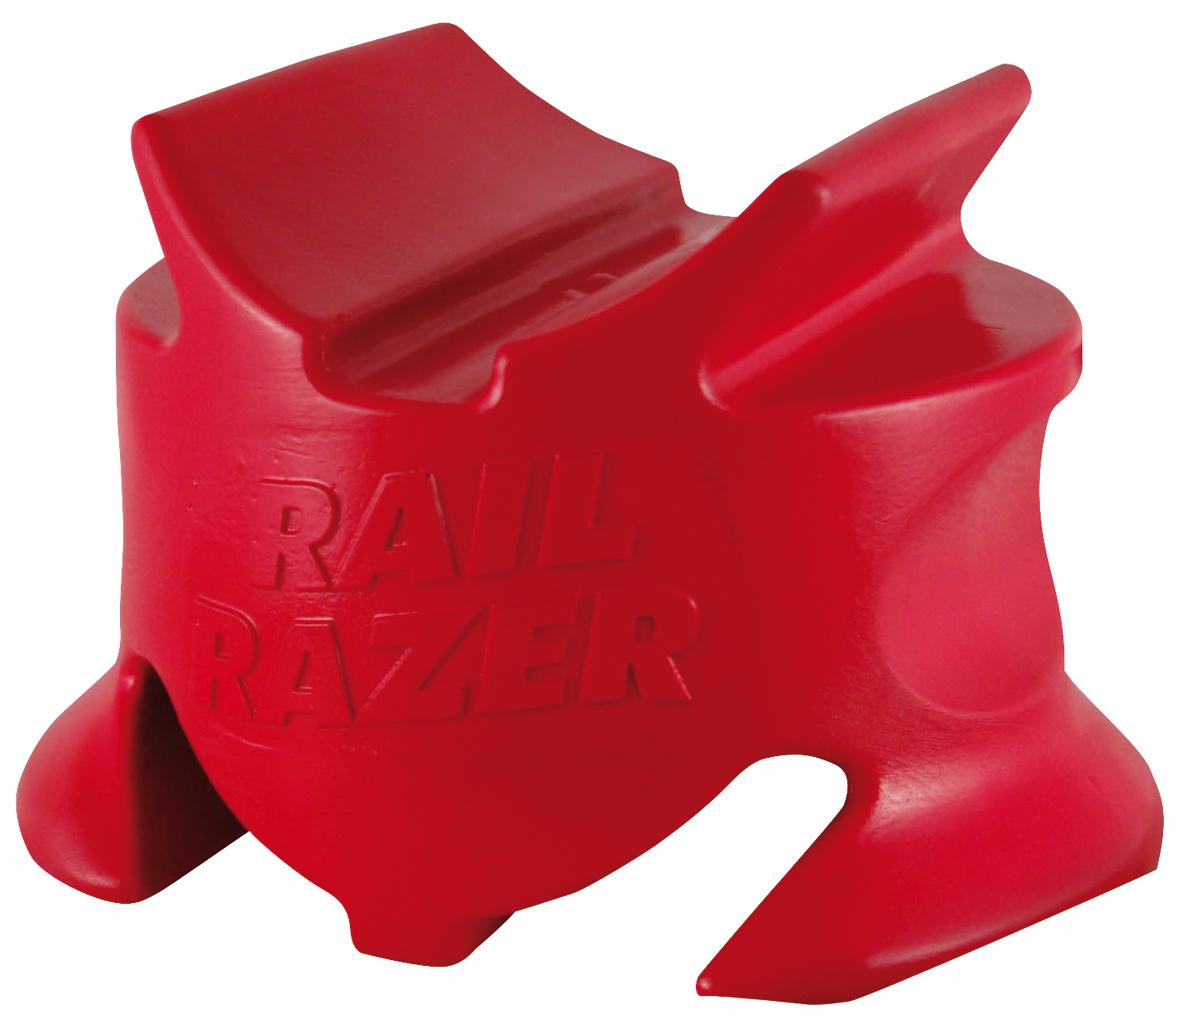 rail-razor.jpg